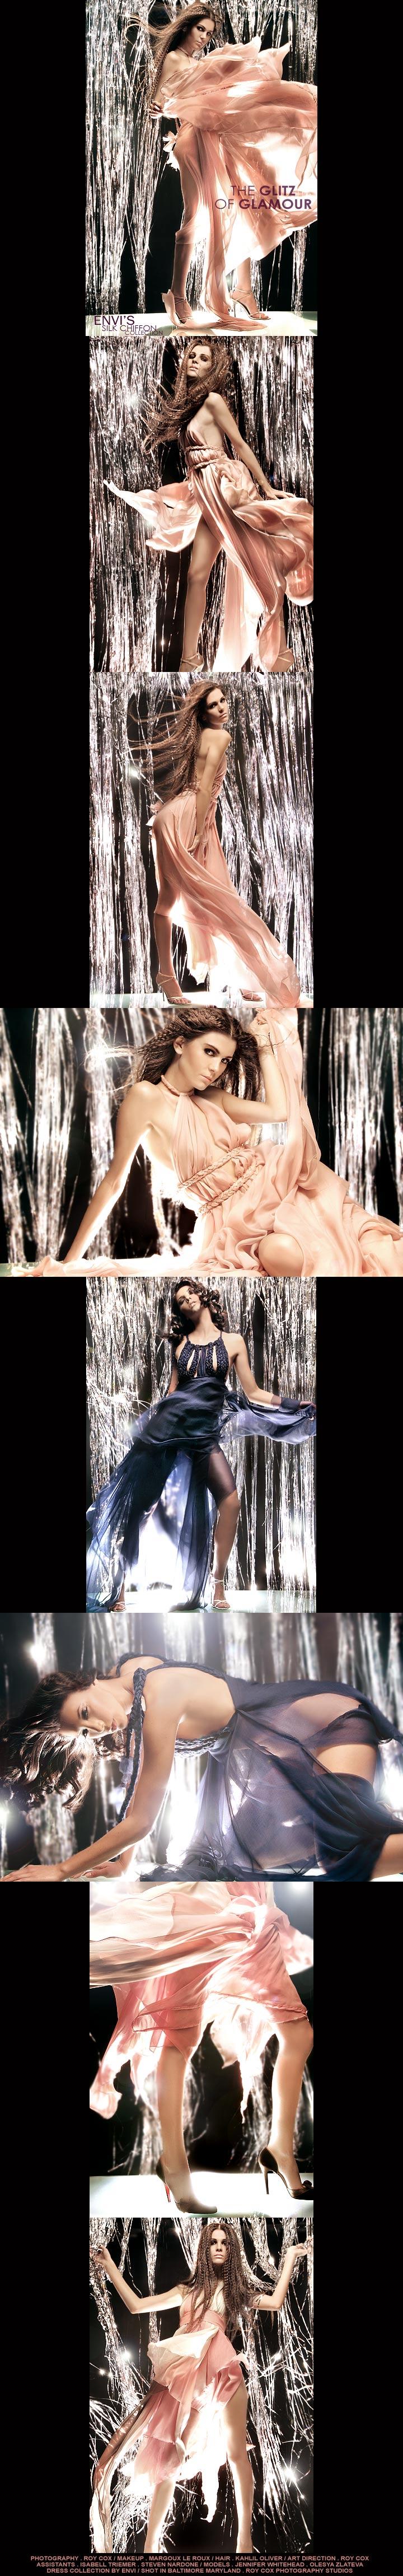 Baltimore MD Sep 02, 2007 Roy Cox Photography - Envi  Glitz of Glamour - Envi Dress Collection